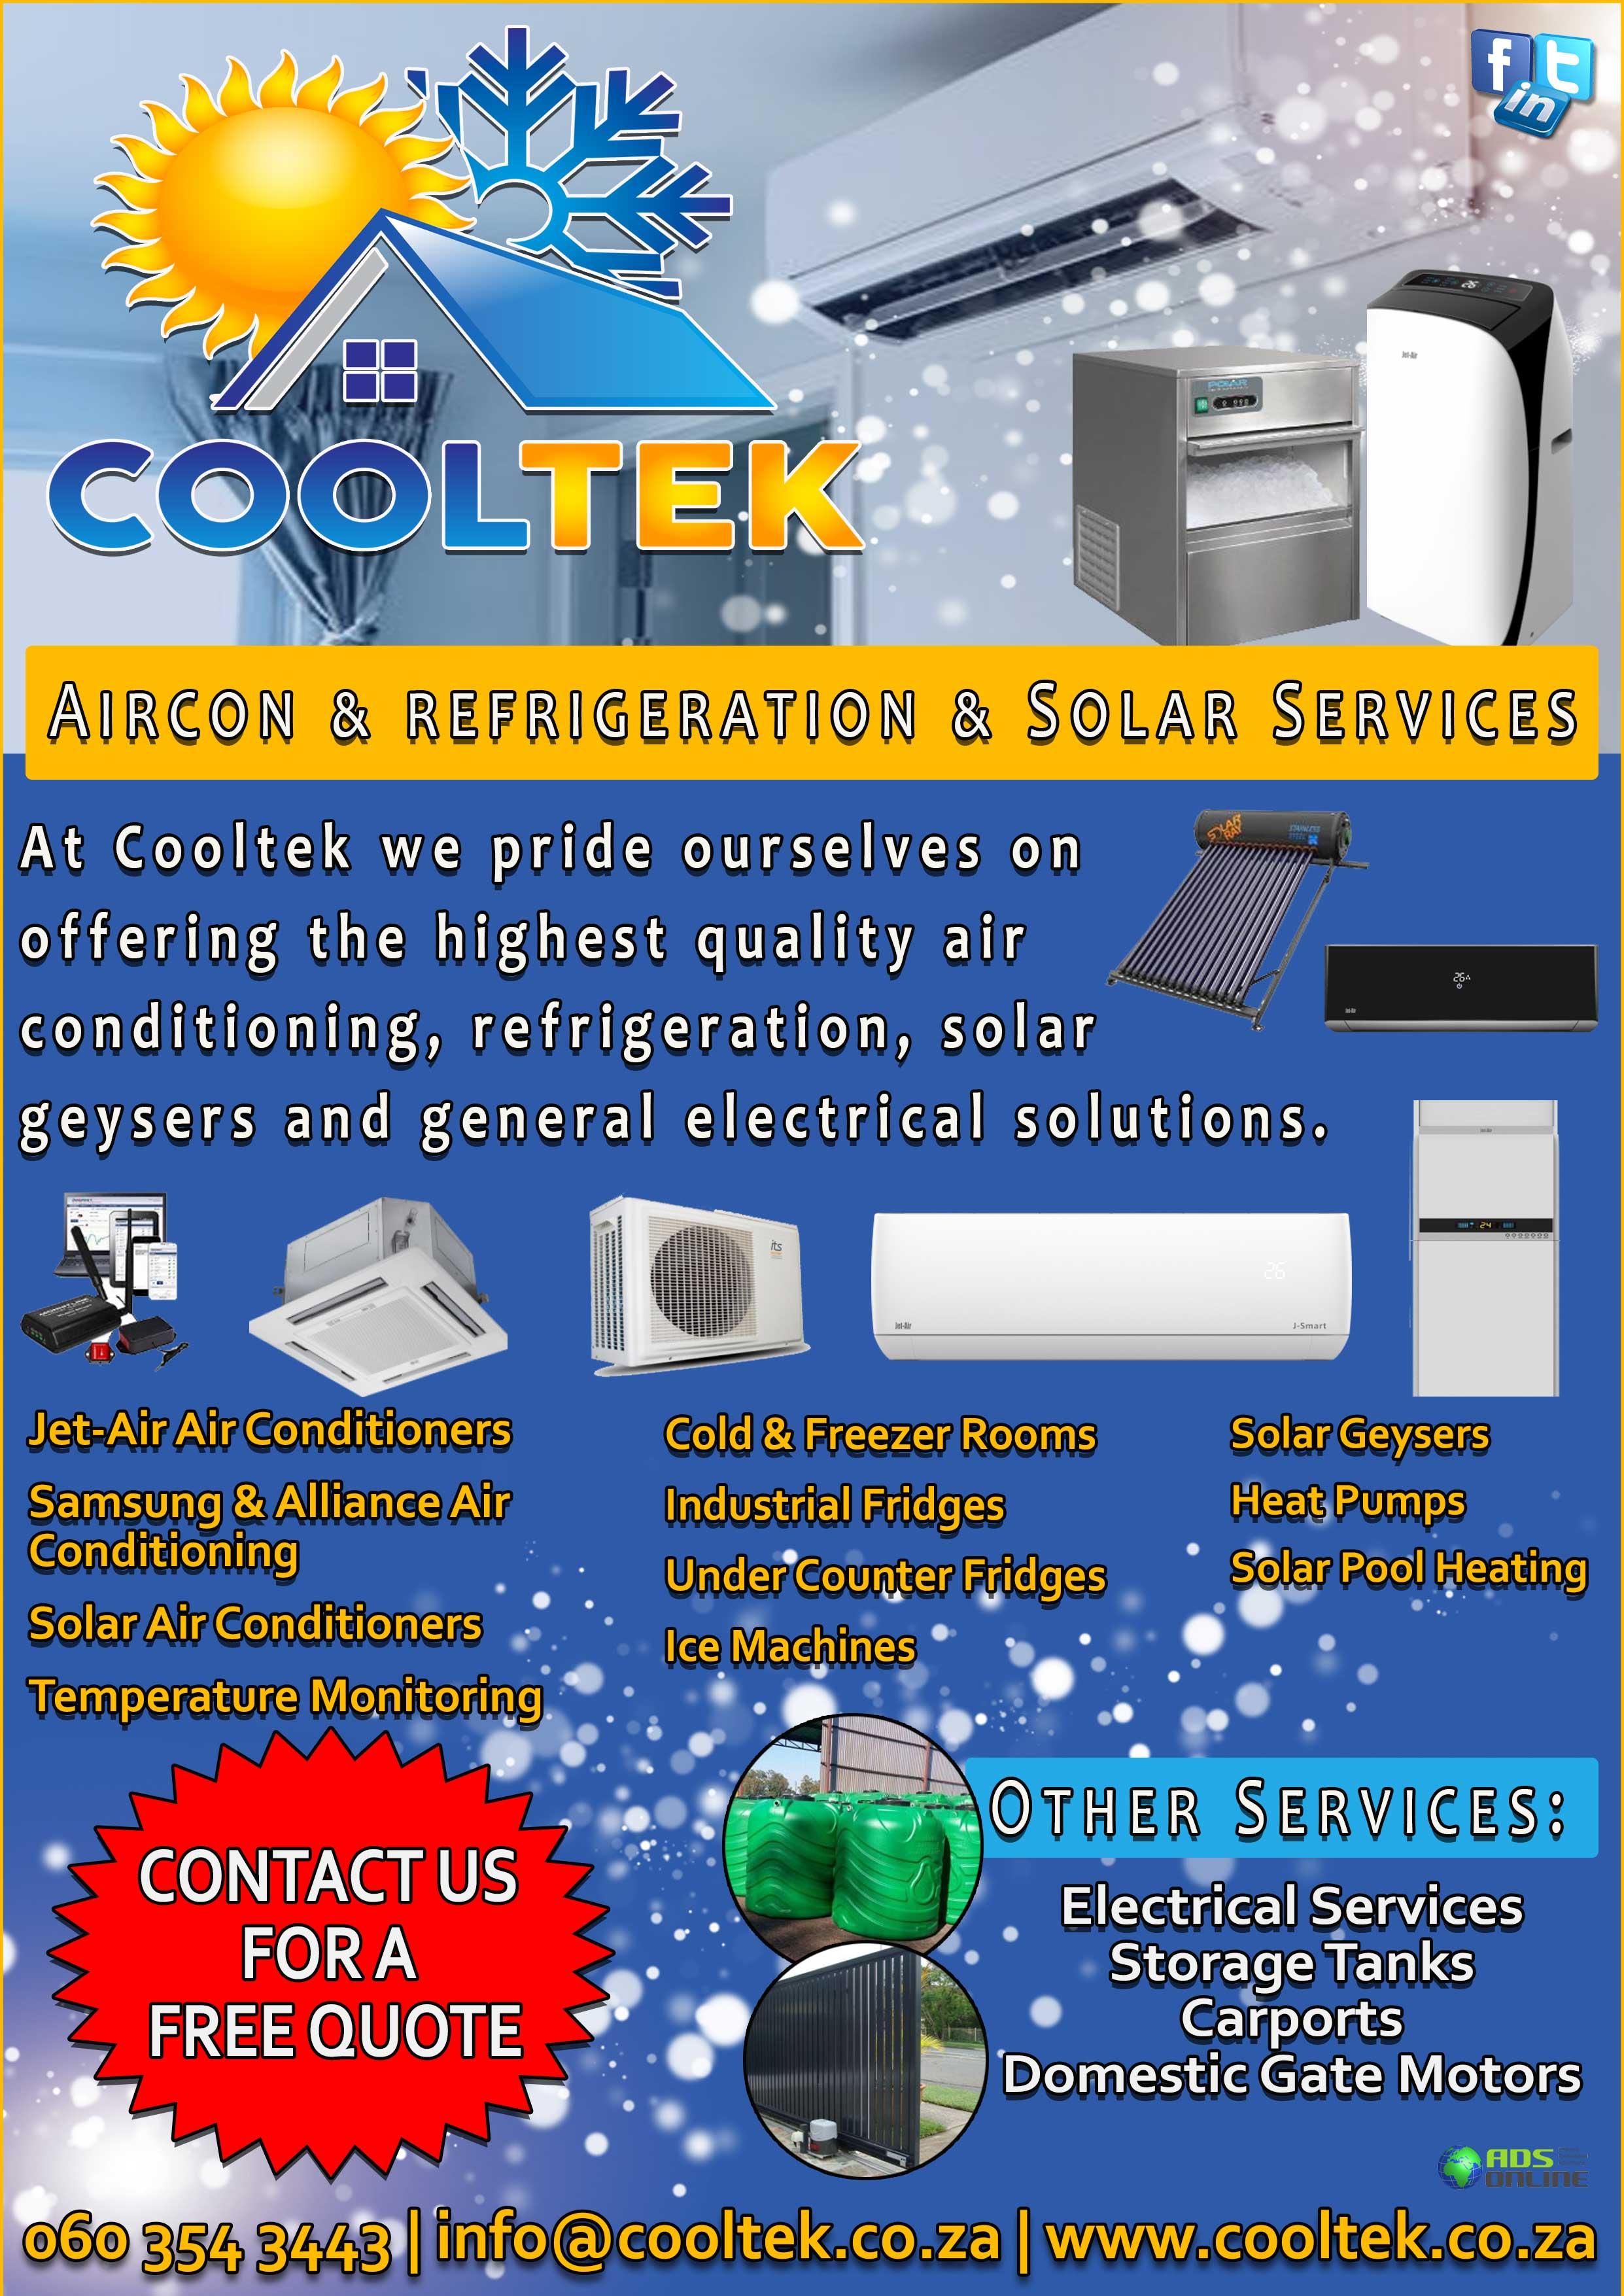 COOLTEK – Aircon & refrigeration & Solar Services | Alberton, Gauteng